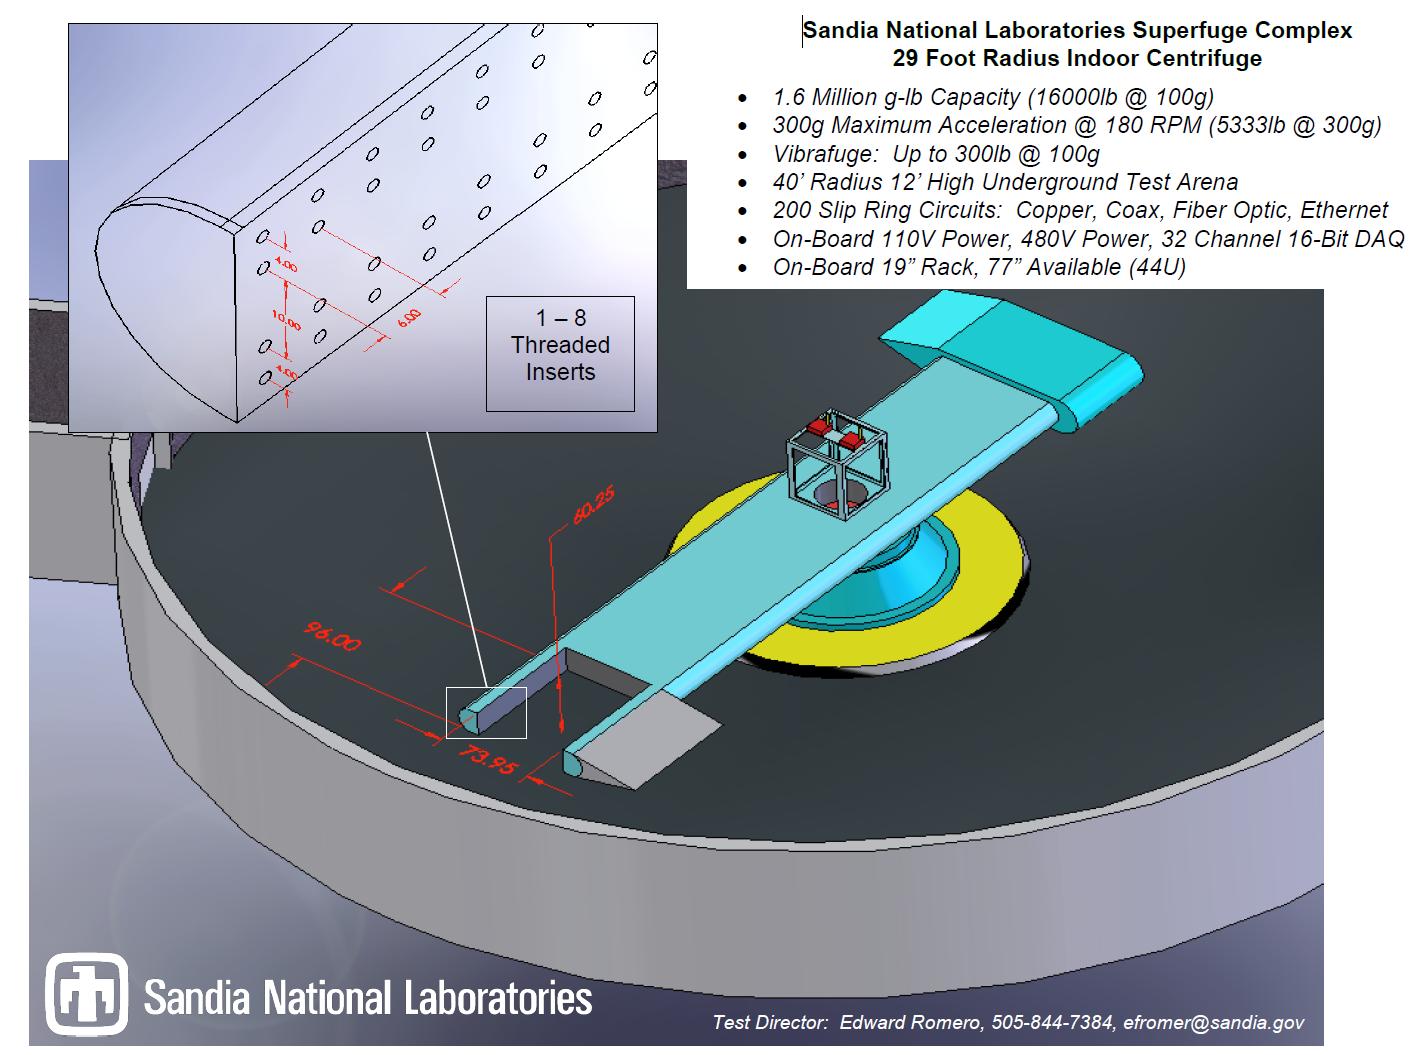 Diagram of Sandia National Labs Superfuge complex